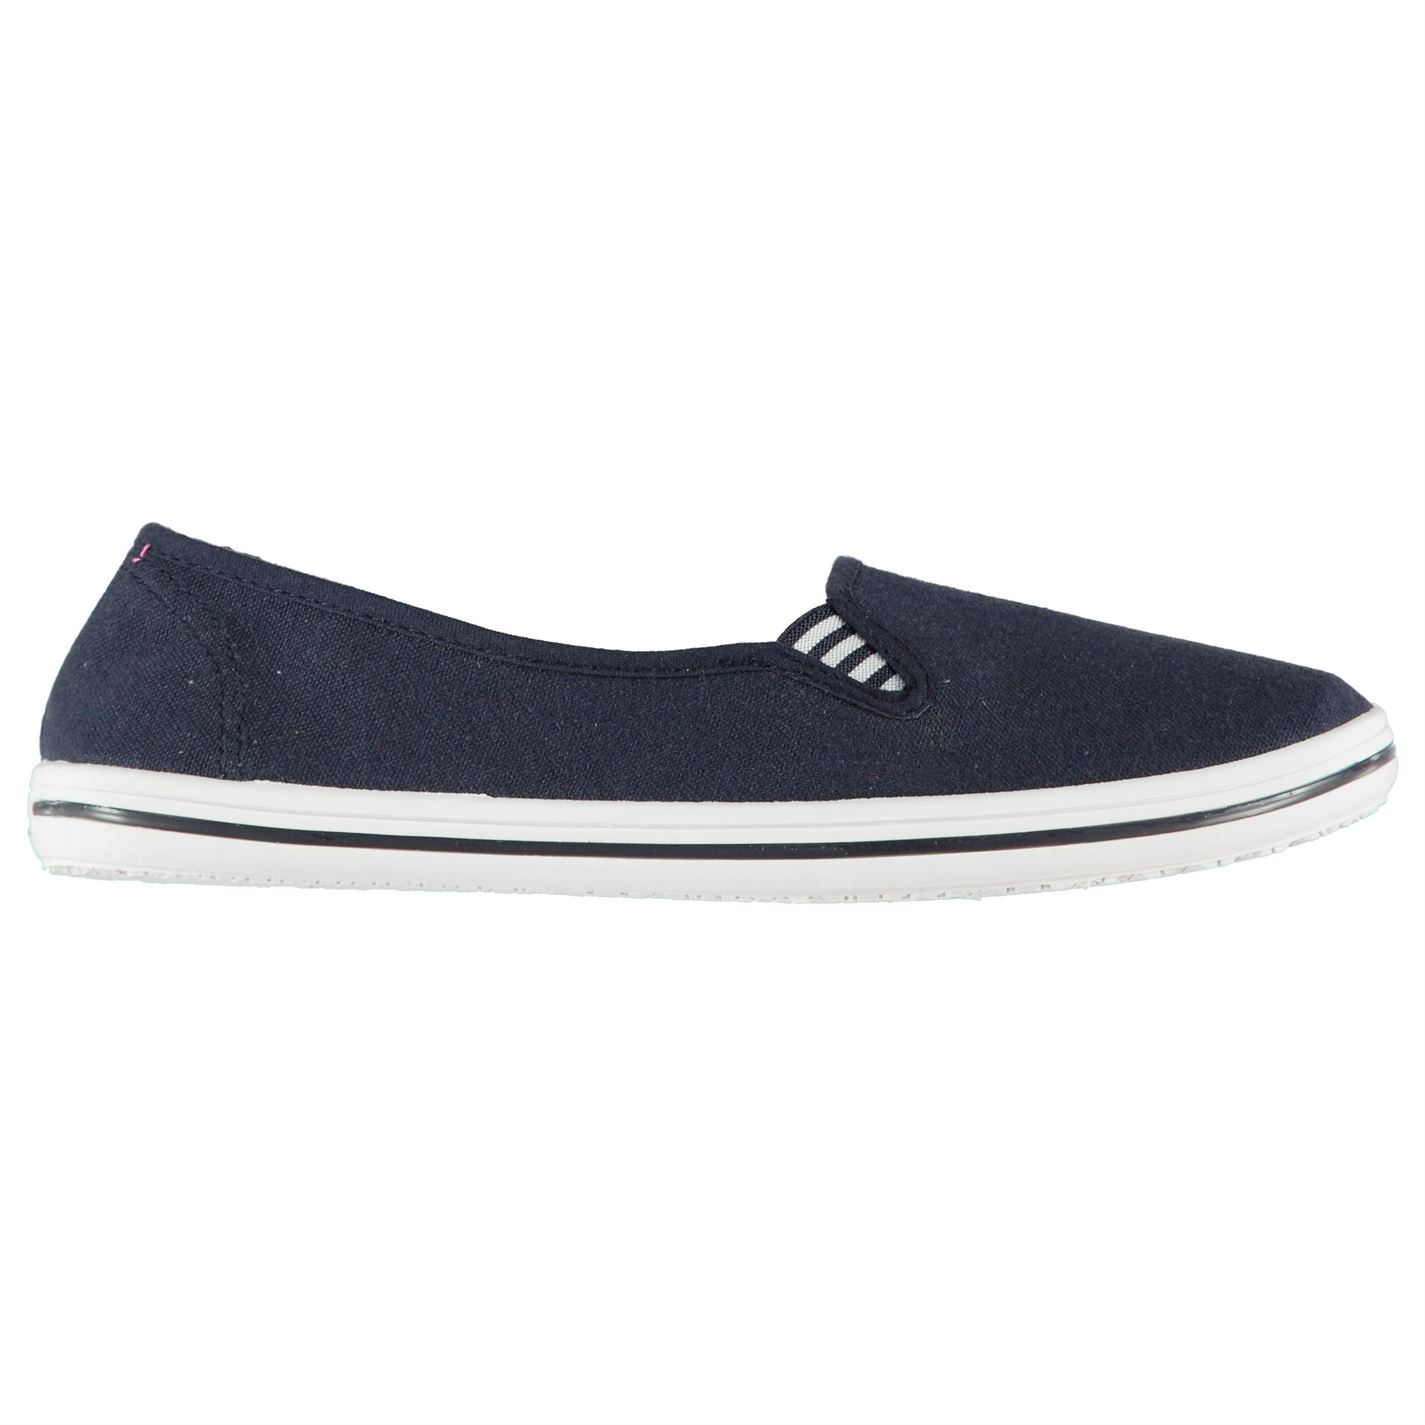 Slazenger Ladies Canvas Slip On Shoes Navy